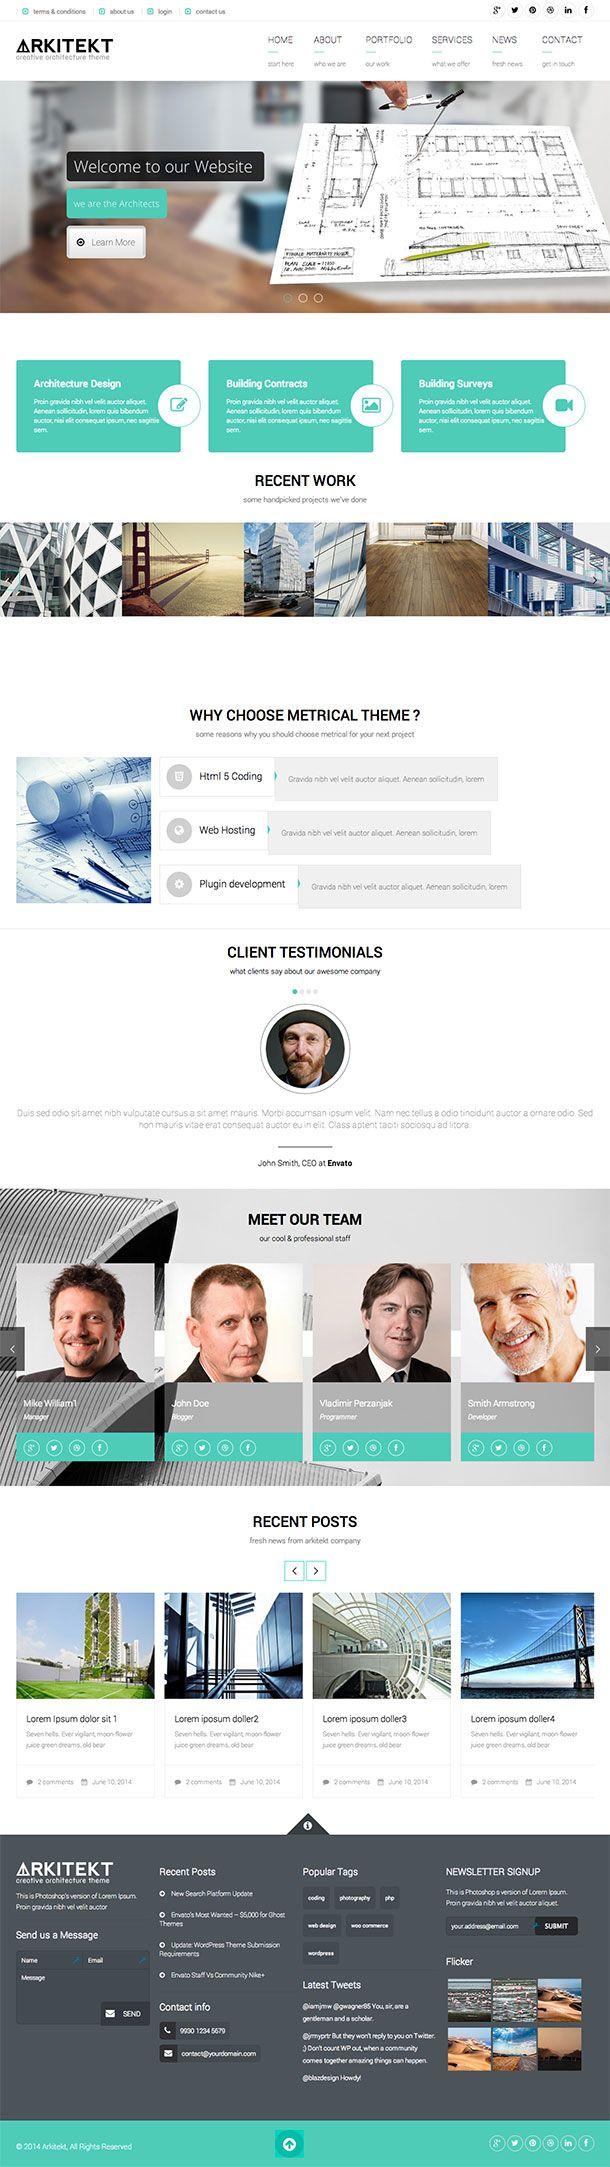 Arkitekt-Wordpress-Theme